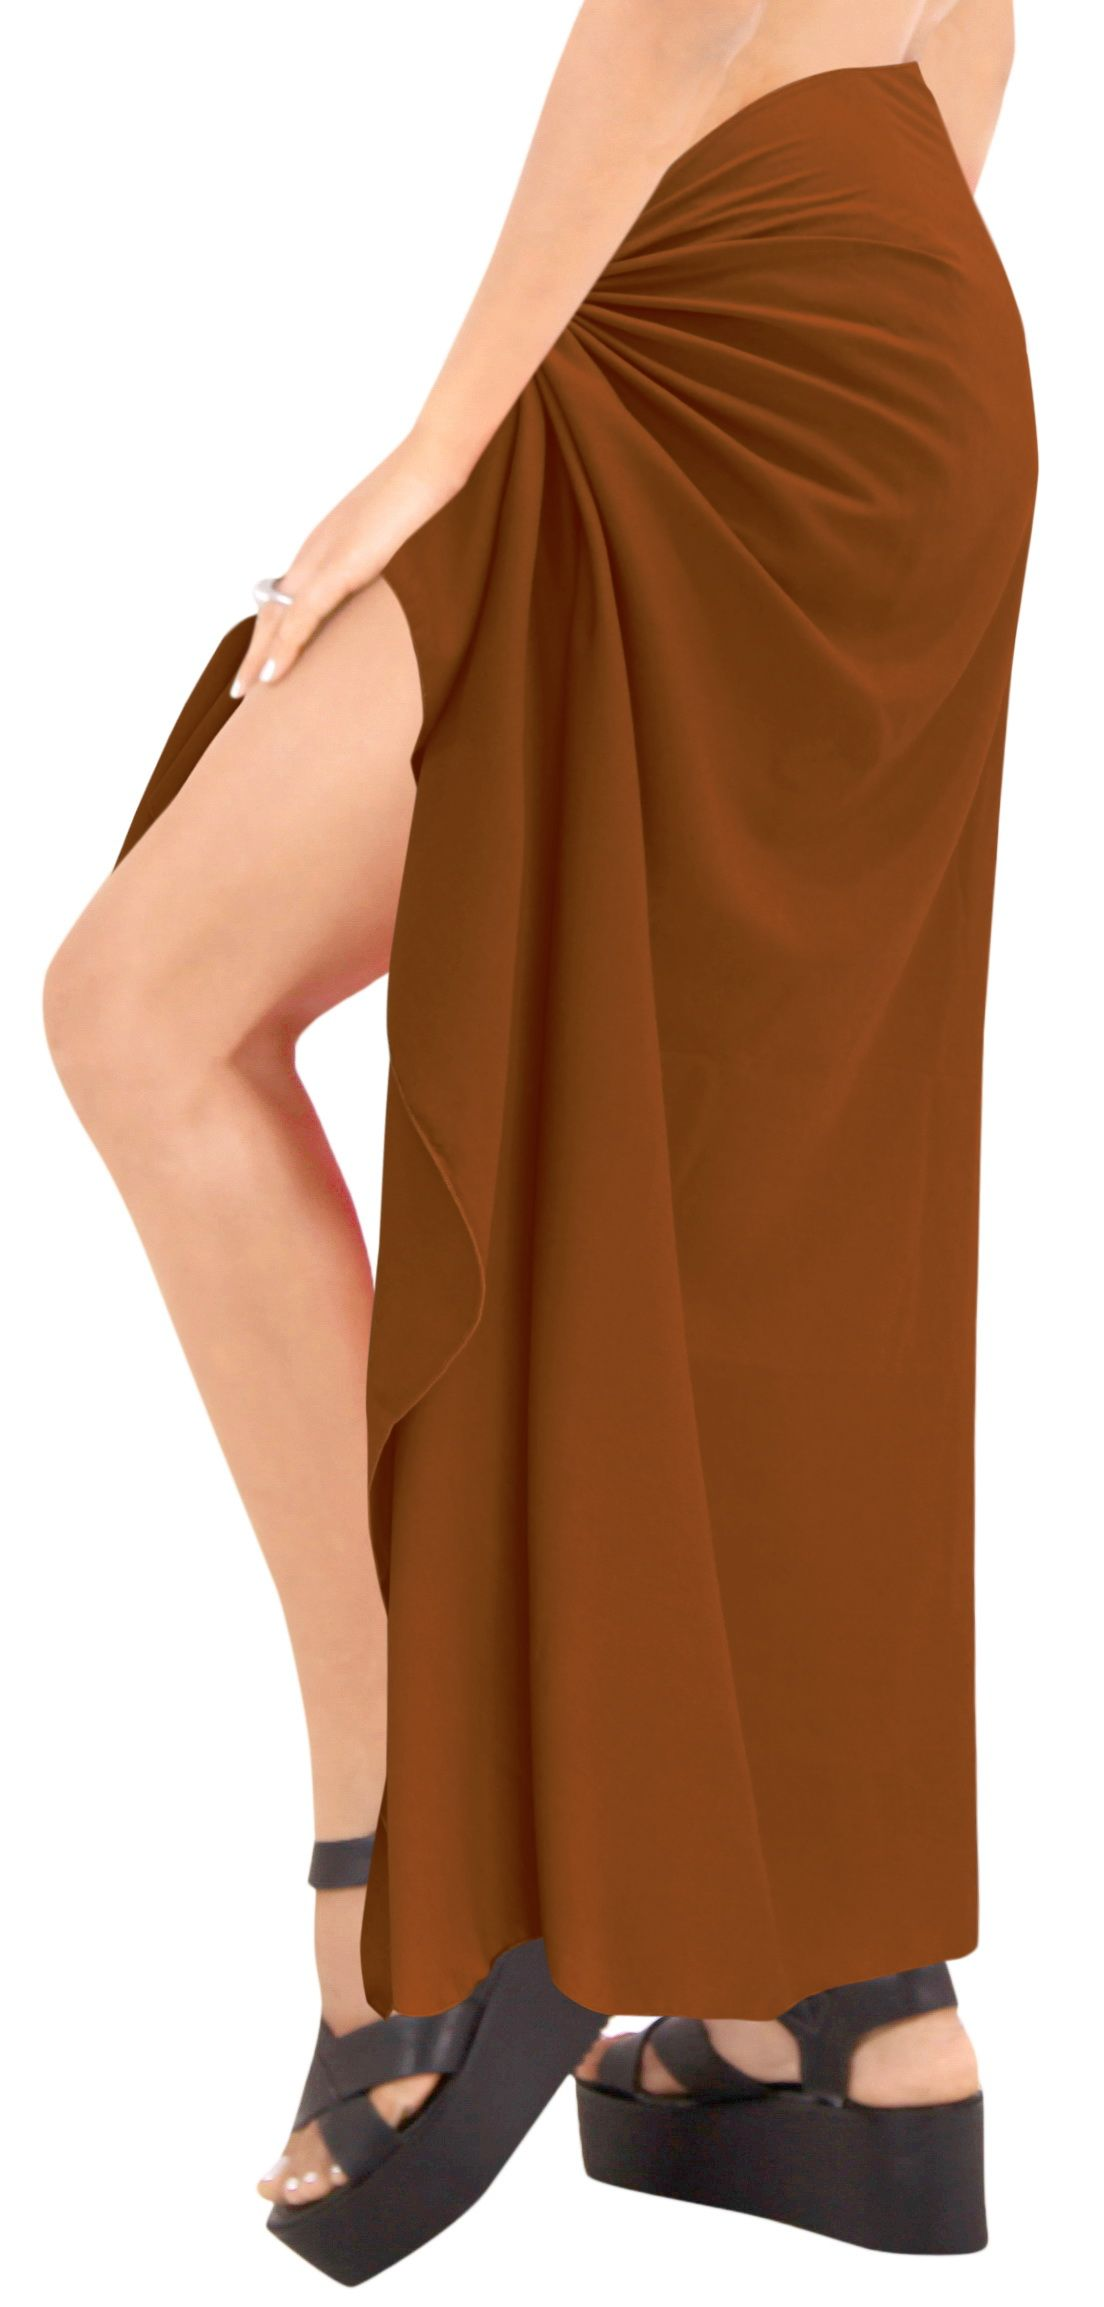 c7d4373aa7efb Sarong Wrap Beachwear Bathing Suit Swimwear Swimsuit Cover ups Pareo Skirt  Women Bathing